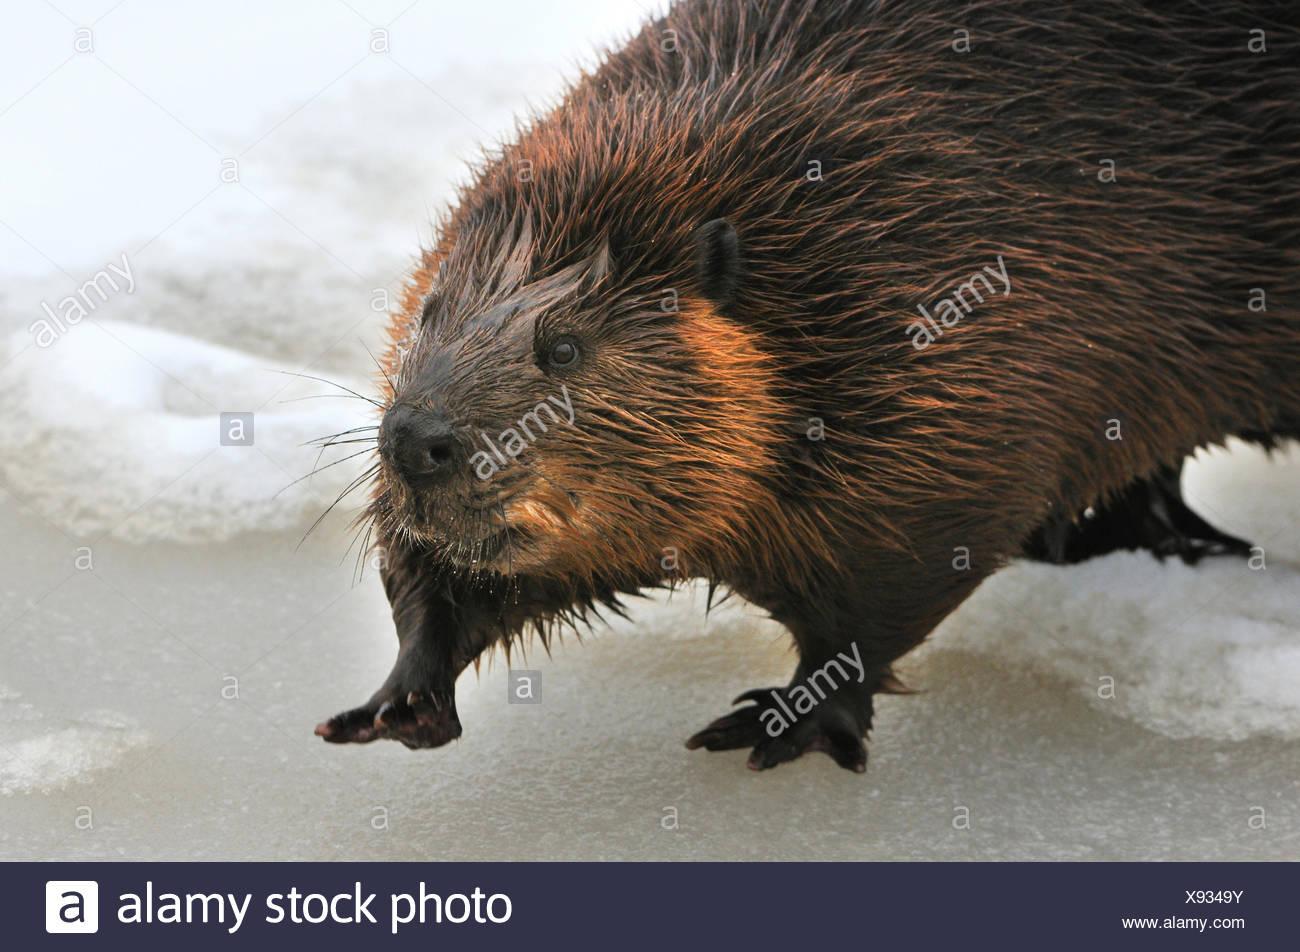 Beavers rodents Castor fiber rodent European beaver mammals rodents beaver damages winter snow animal animals Germany Europe, - Stock Image